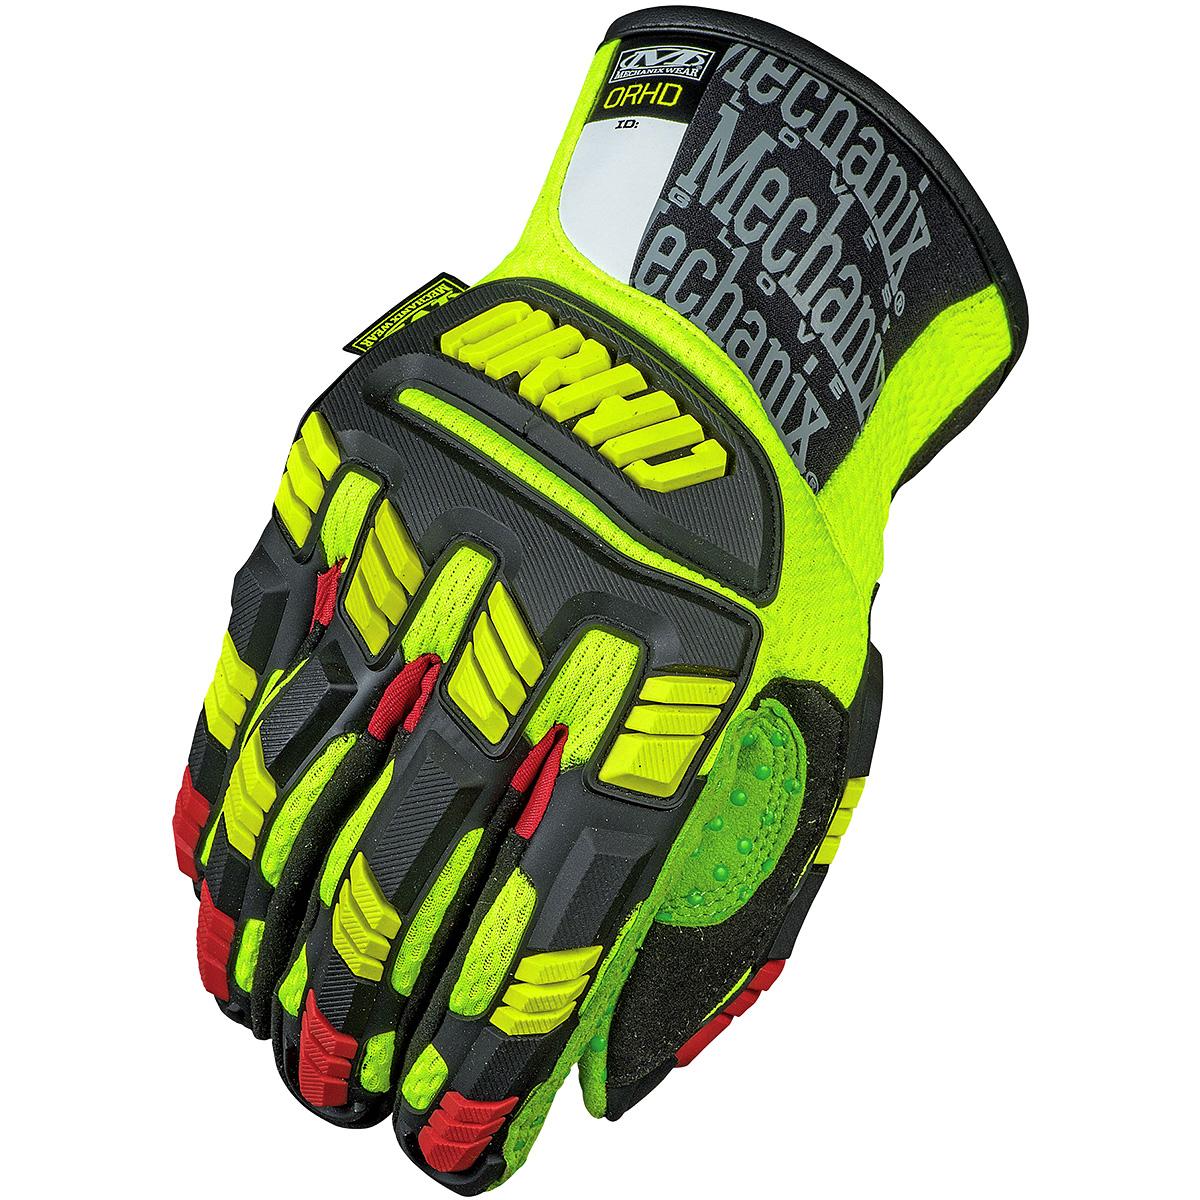 Fingerless driving gloves ebay - Picture 3 Of 6